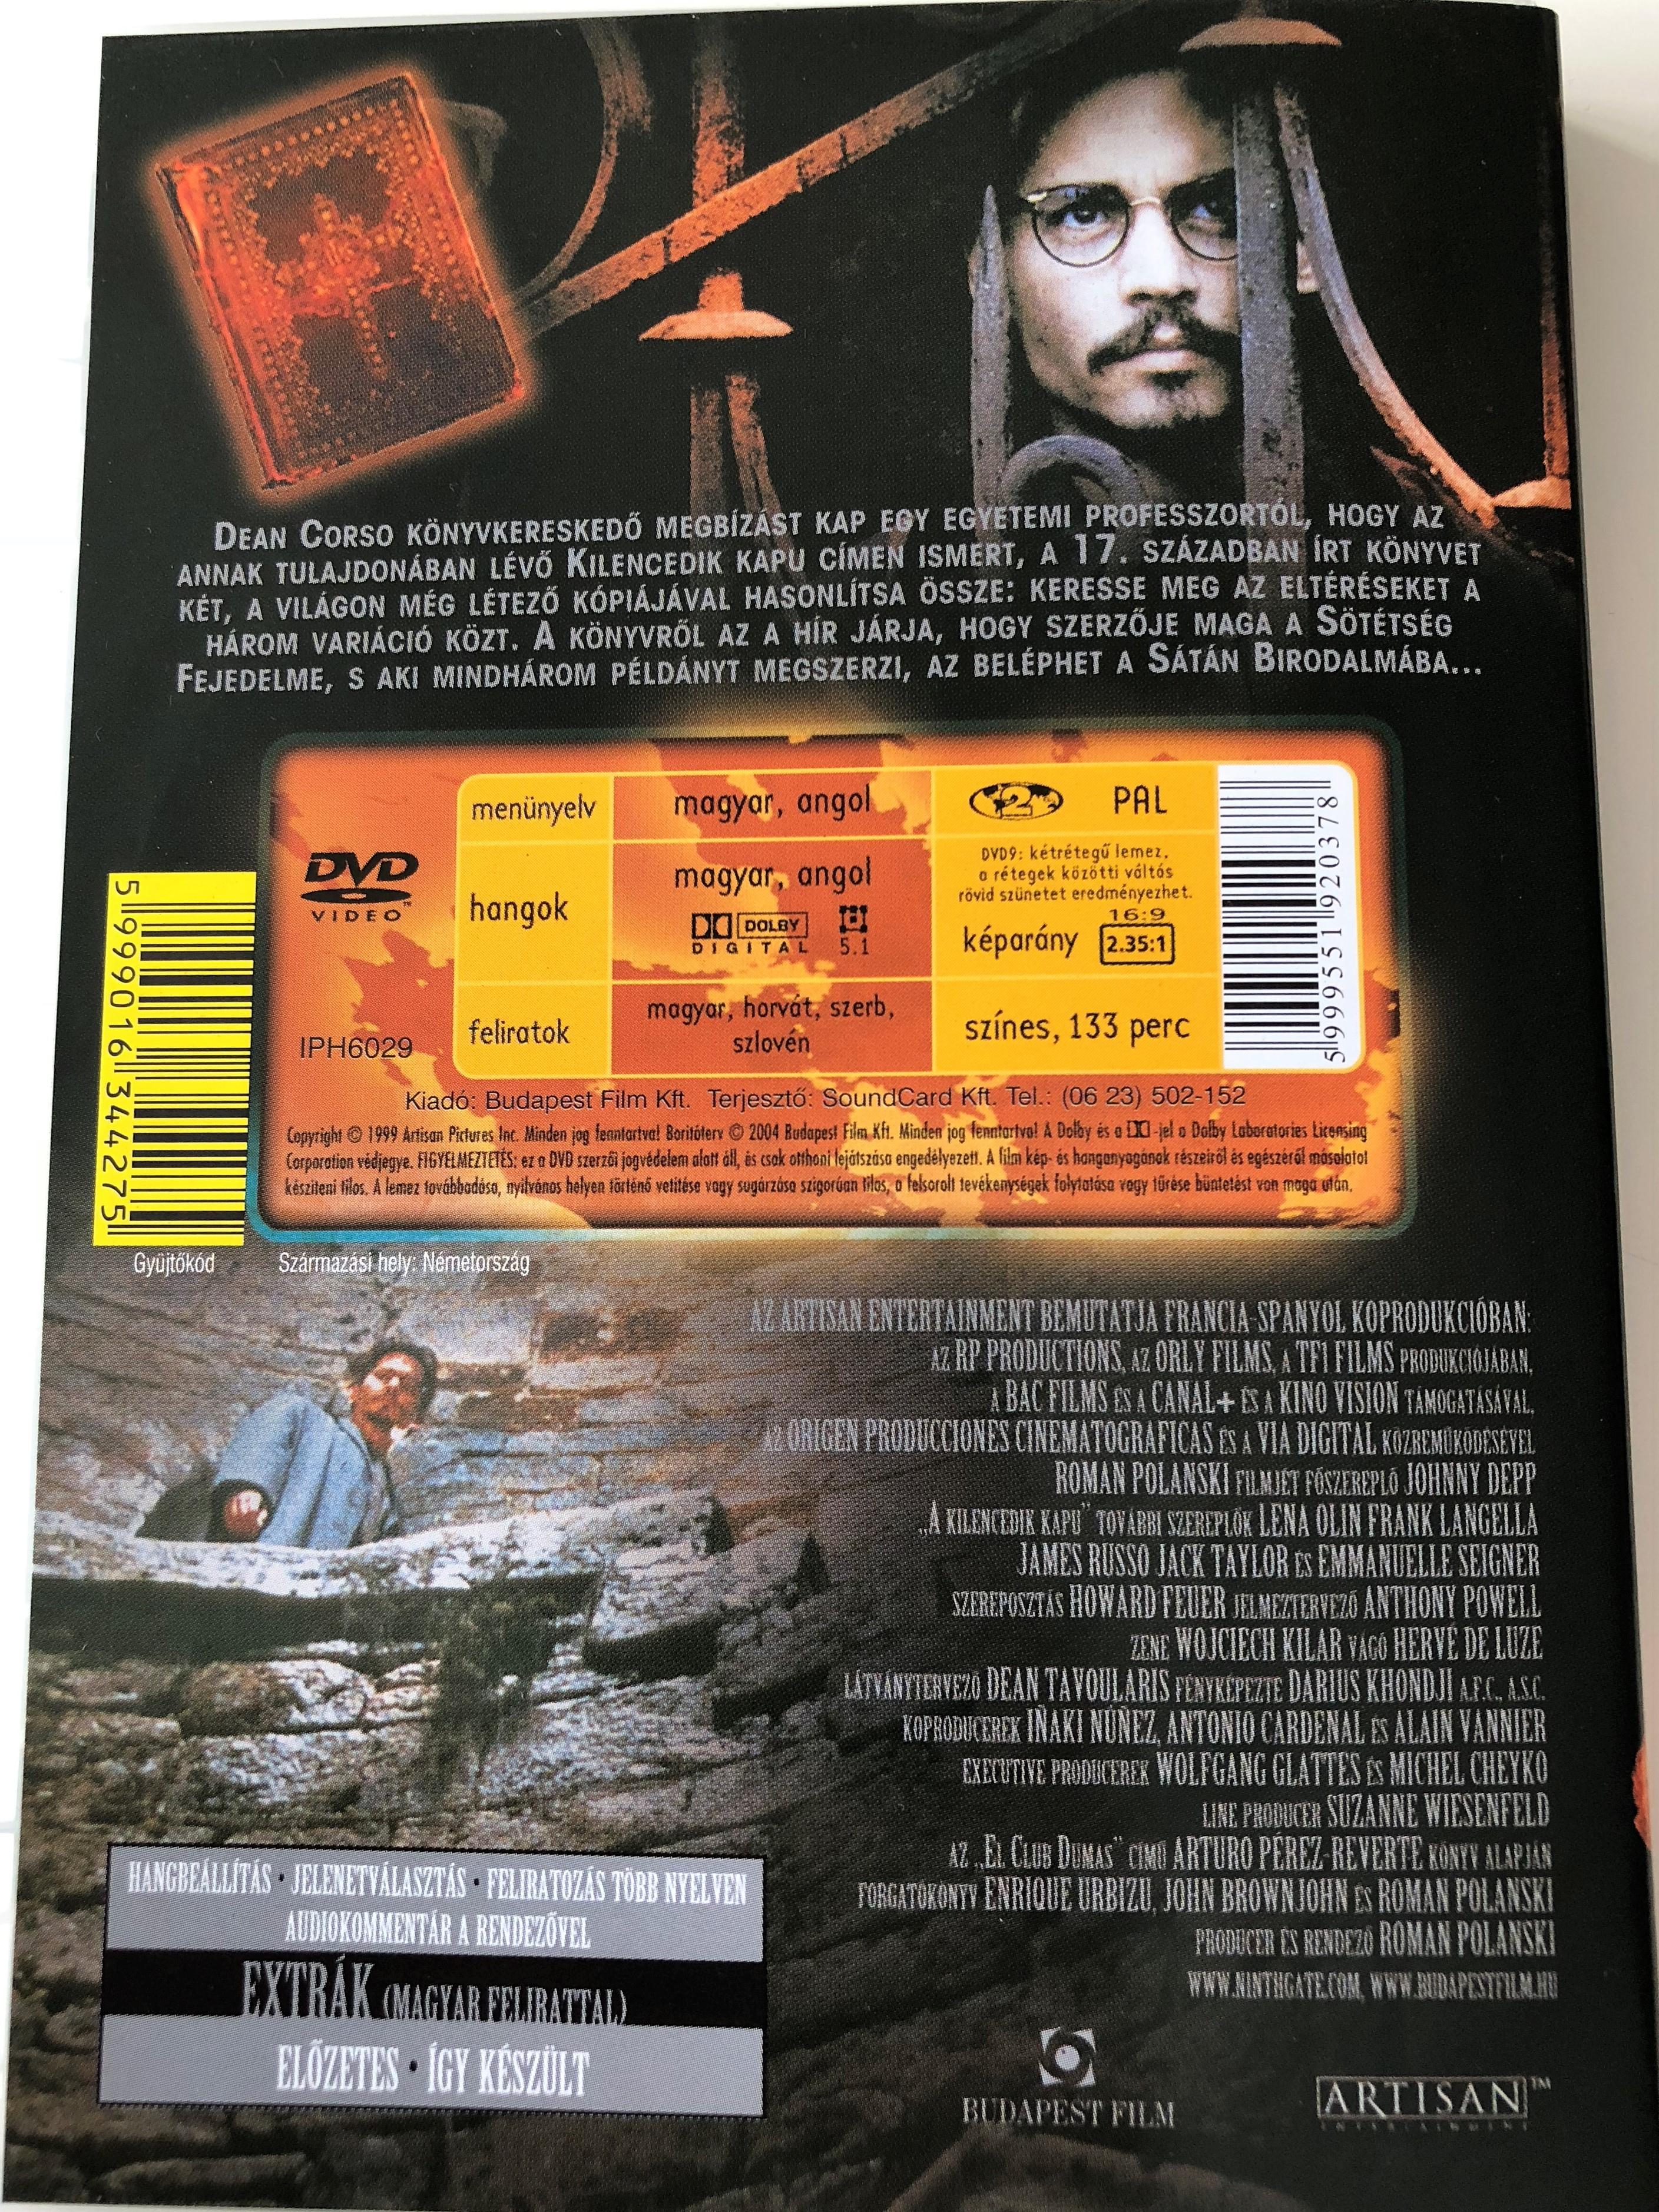 the-ninth-gate-dvd-1999-a-kilencedik-kapu-directed-by-roman-polanski-starring-johnny-depp-lena-olin-frank-langella-james-russo-jack-taylor-emmanuelle-seigner-2-.jpg